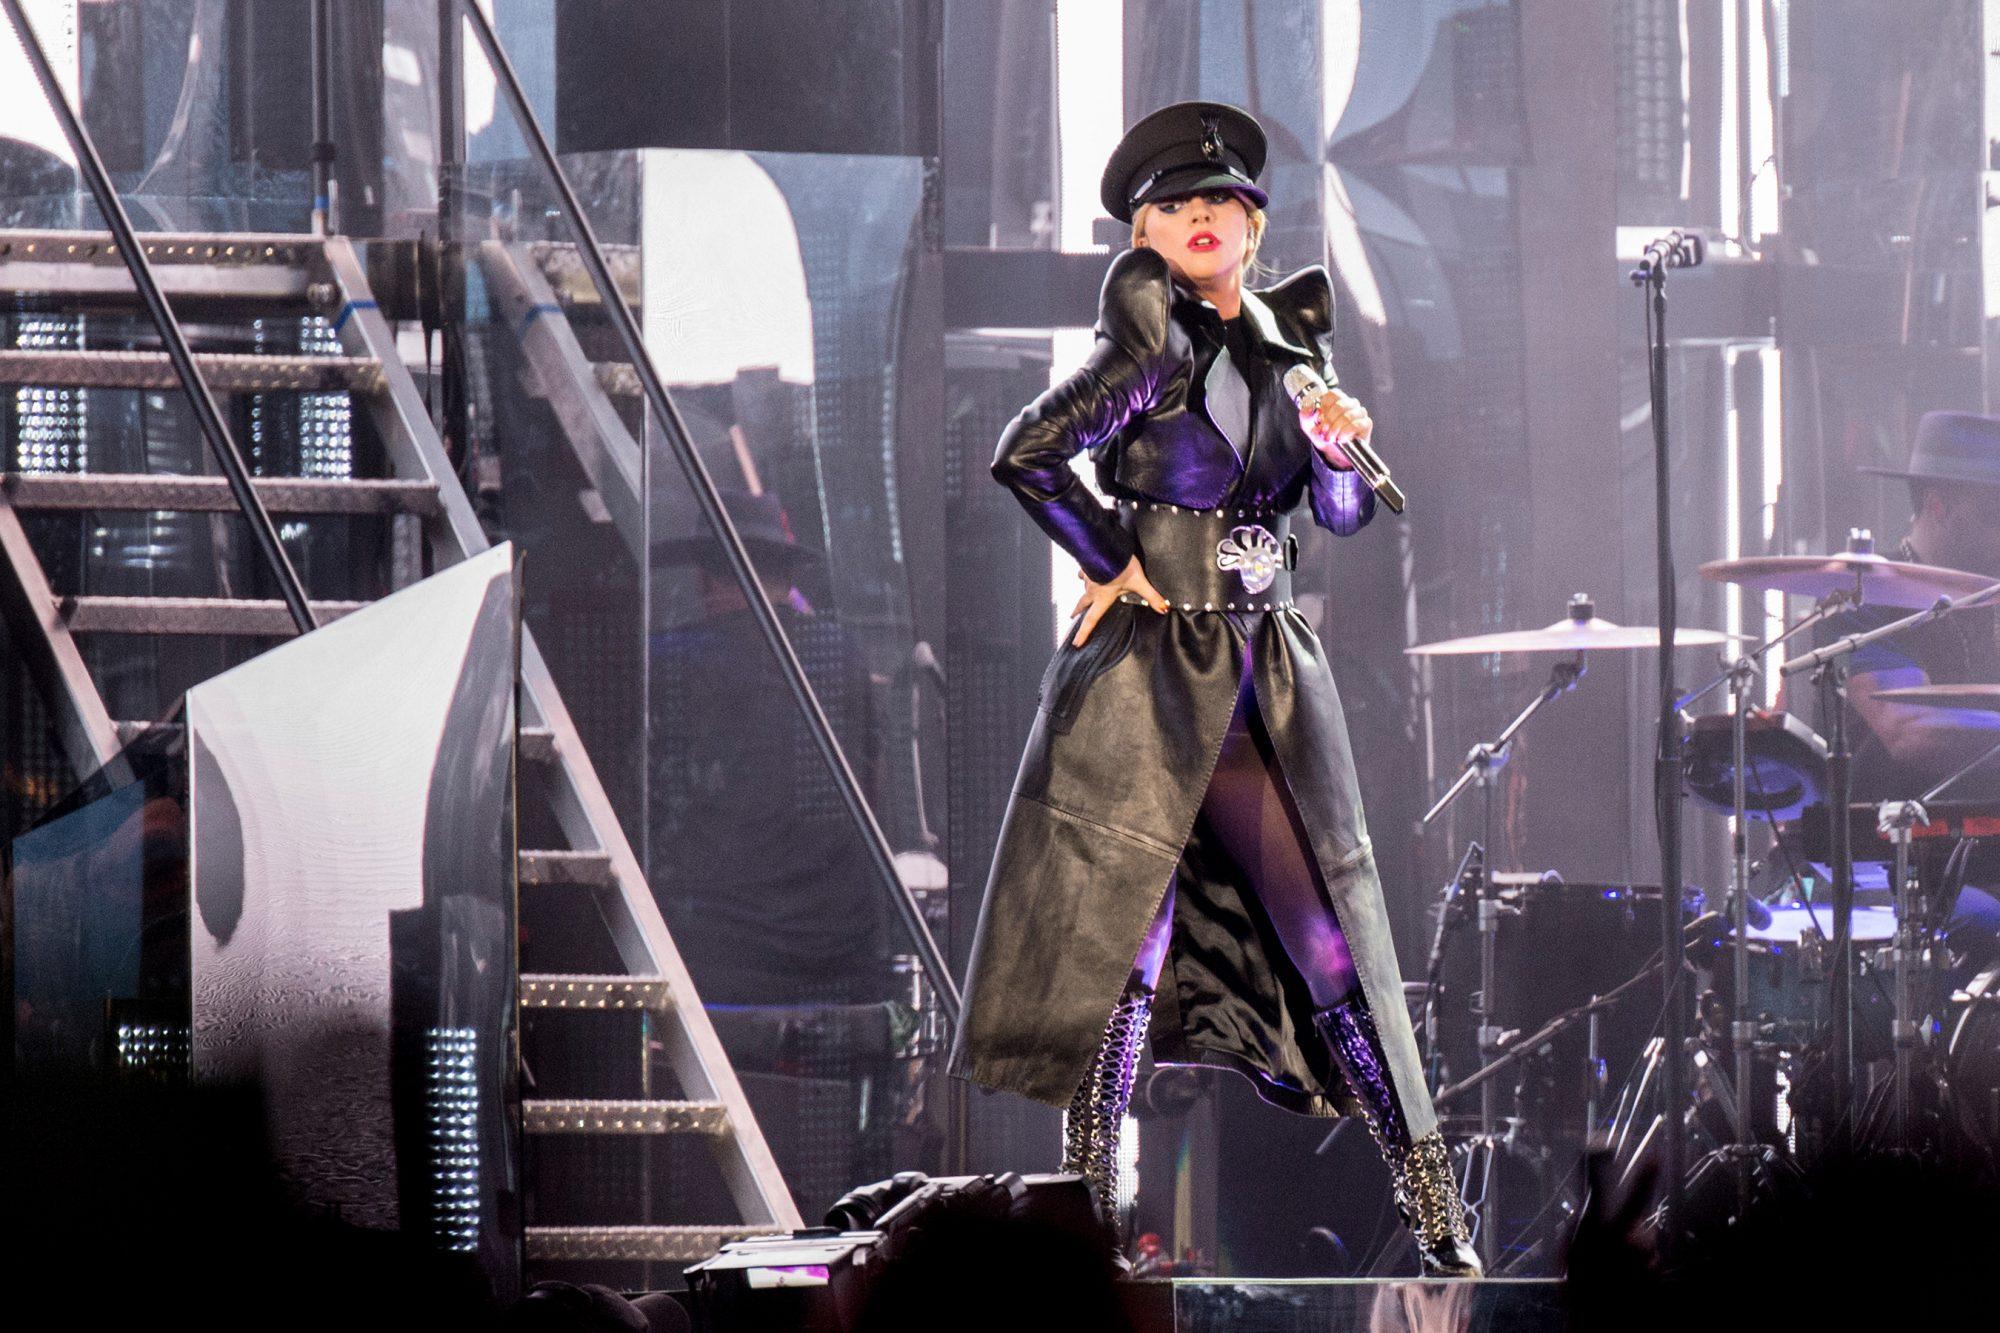 Lady Gaga,Stefani Joanne Angelina Germanotta